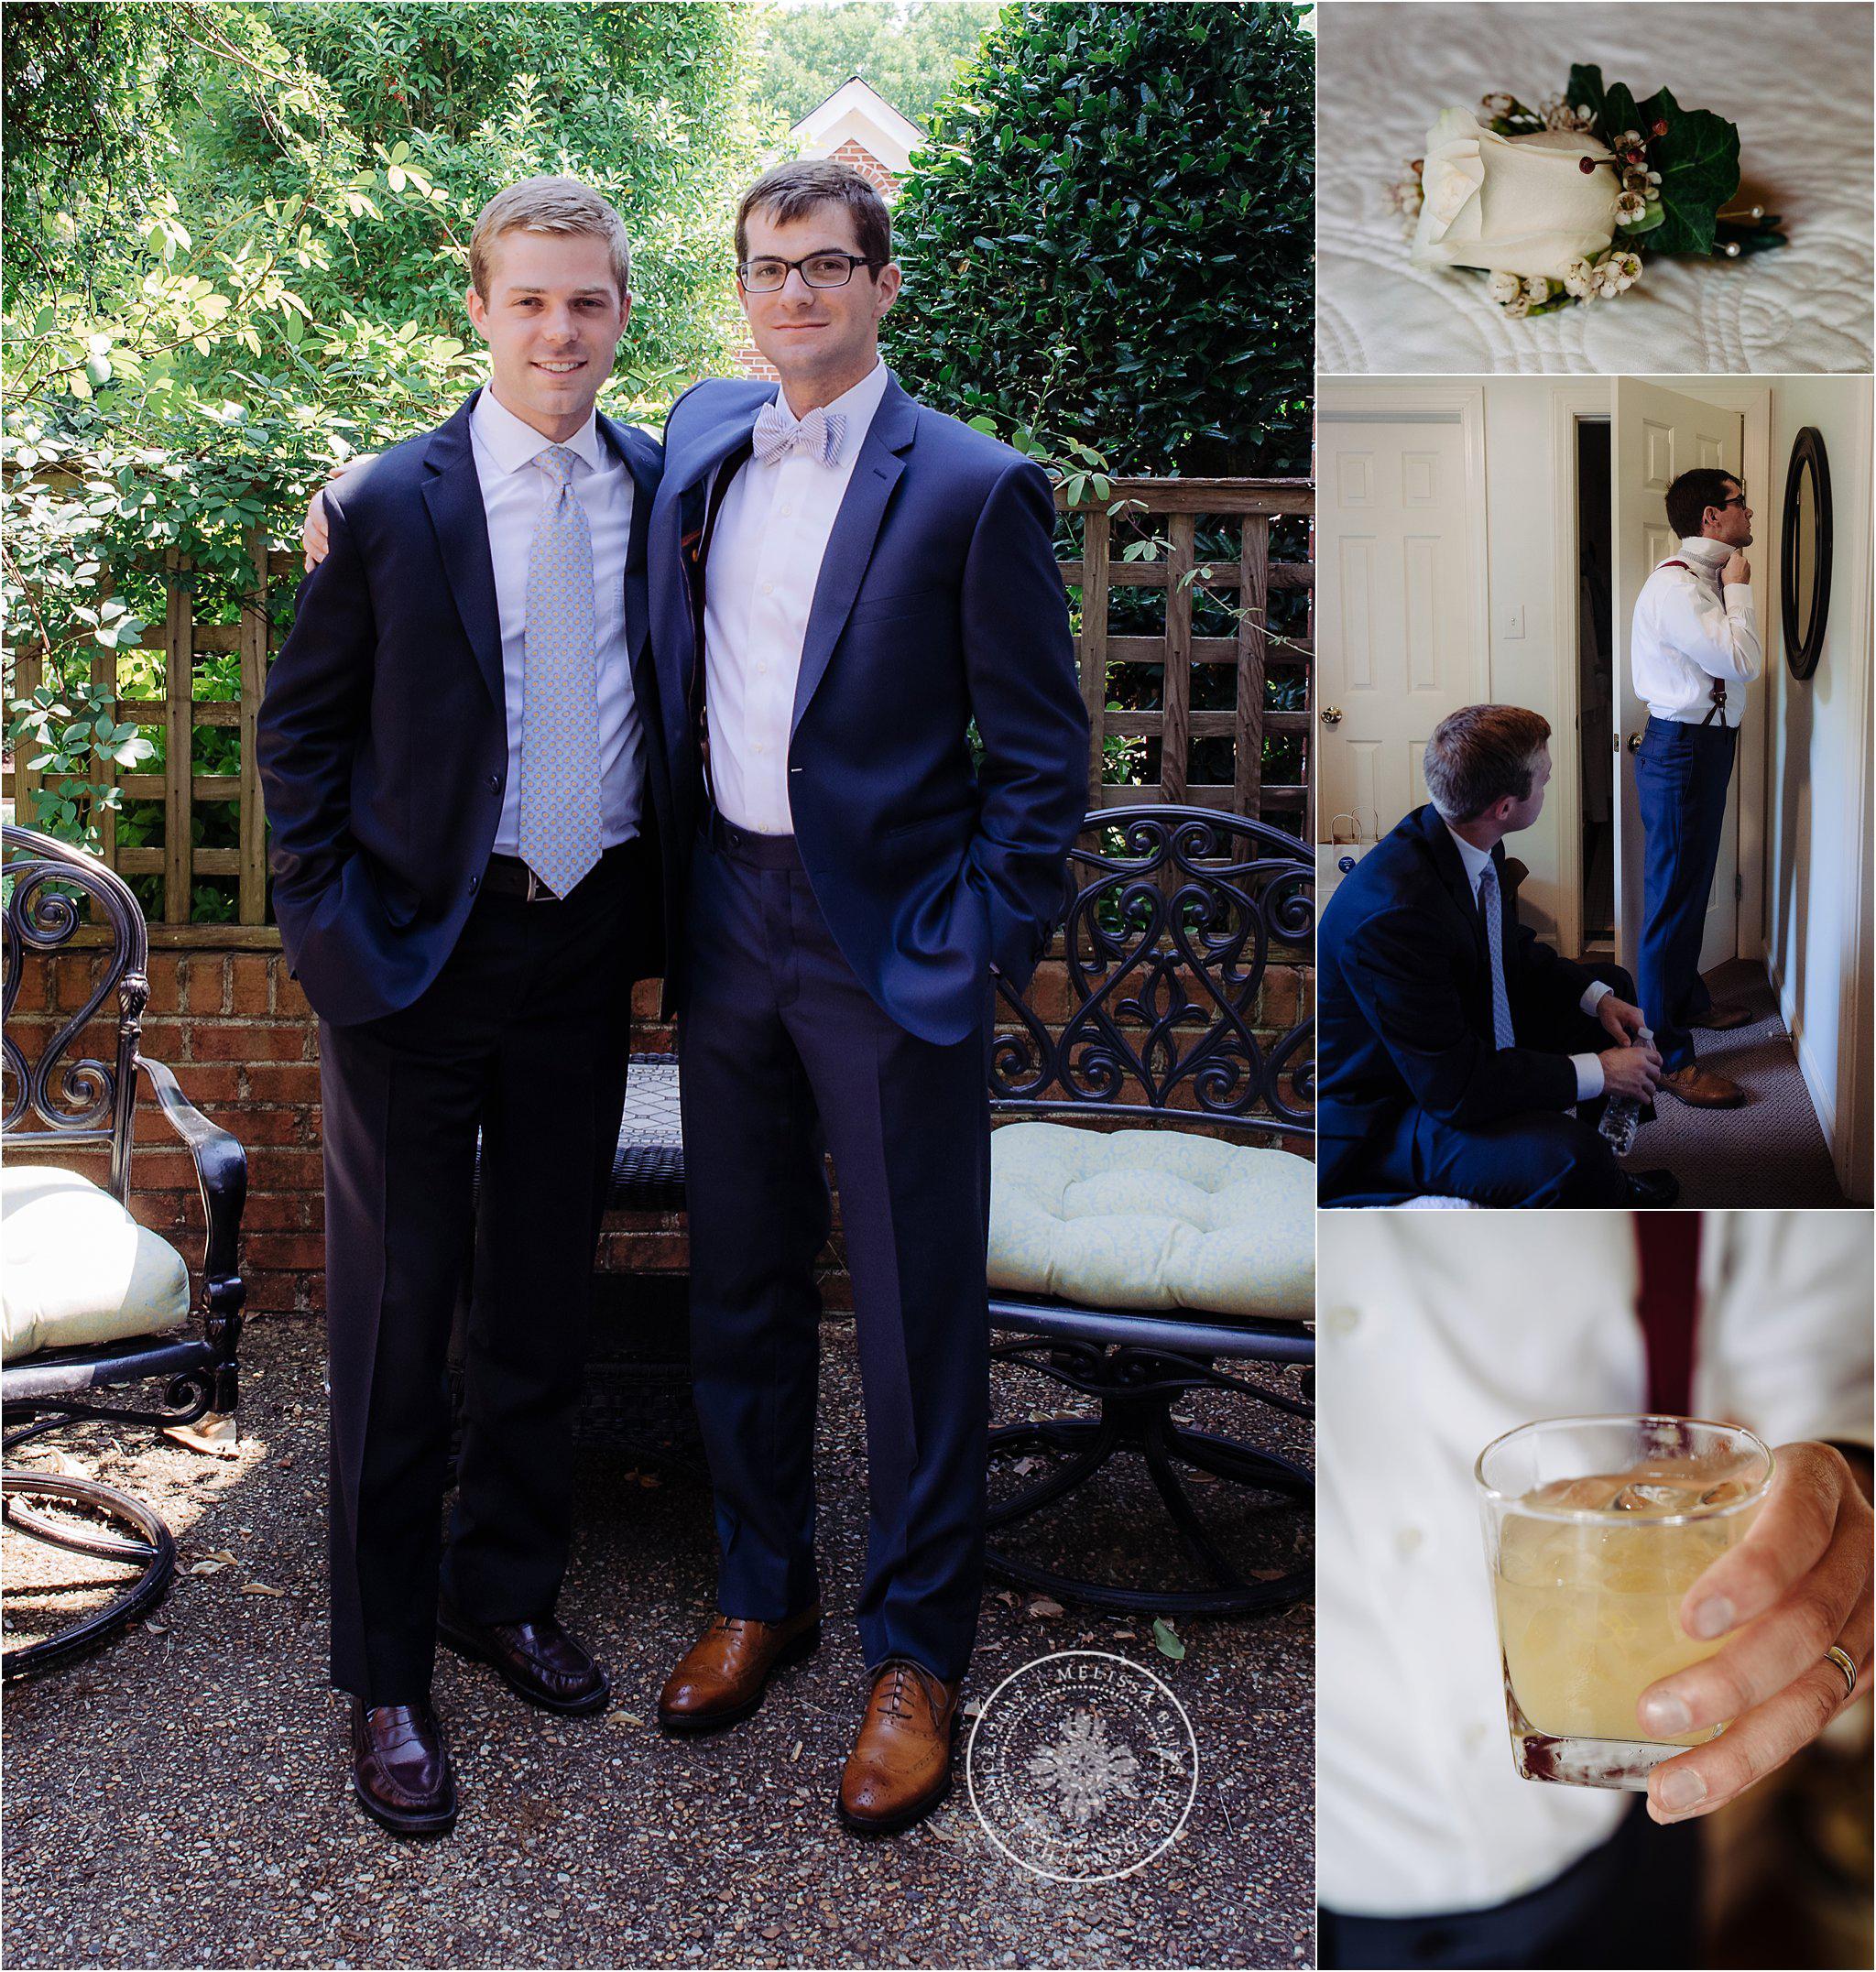 virginia-beach-wedding-photographer-church-point-manor-wedding-day-inspiration-melissa-bliss-photography-norfolk-portsmouth-chesapeake-williamsburg-wedding-photographers